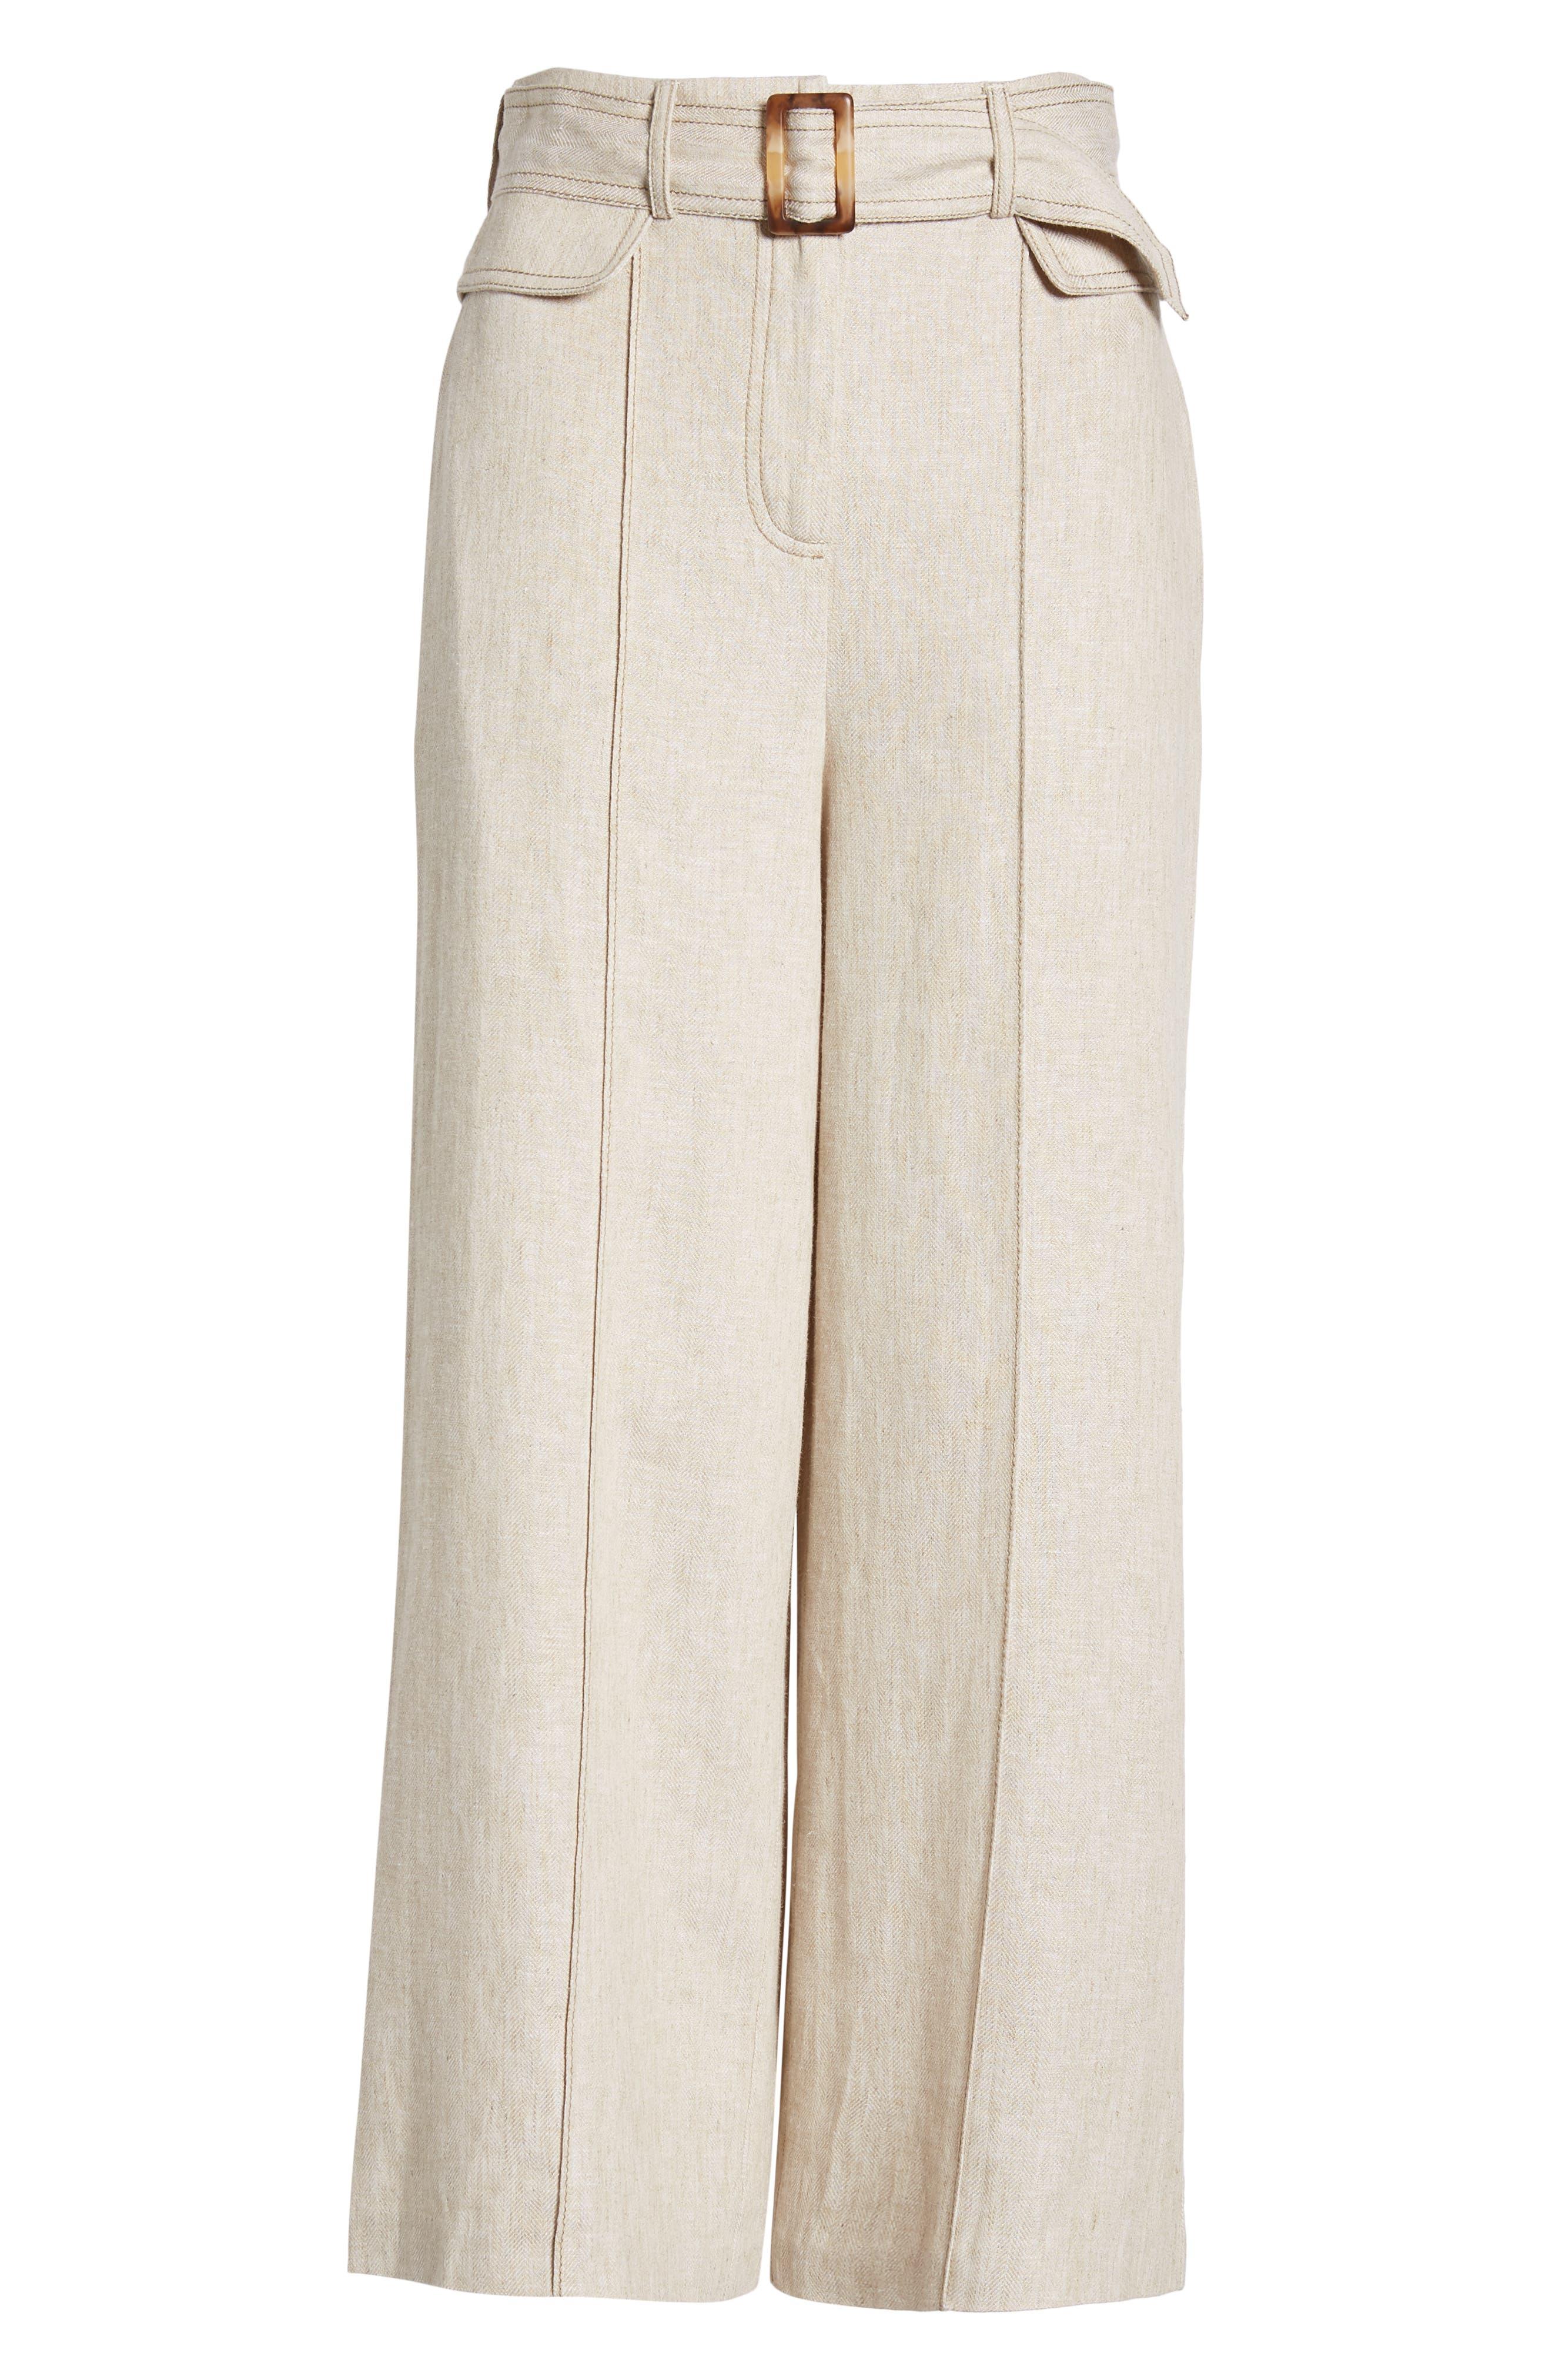 CHRISELLE LIM COLLECTION, Chriselle Lim Toulouse Wide Leg Crop Trousers, Alternate thumbnail 7, color, OATMEAL